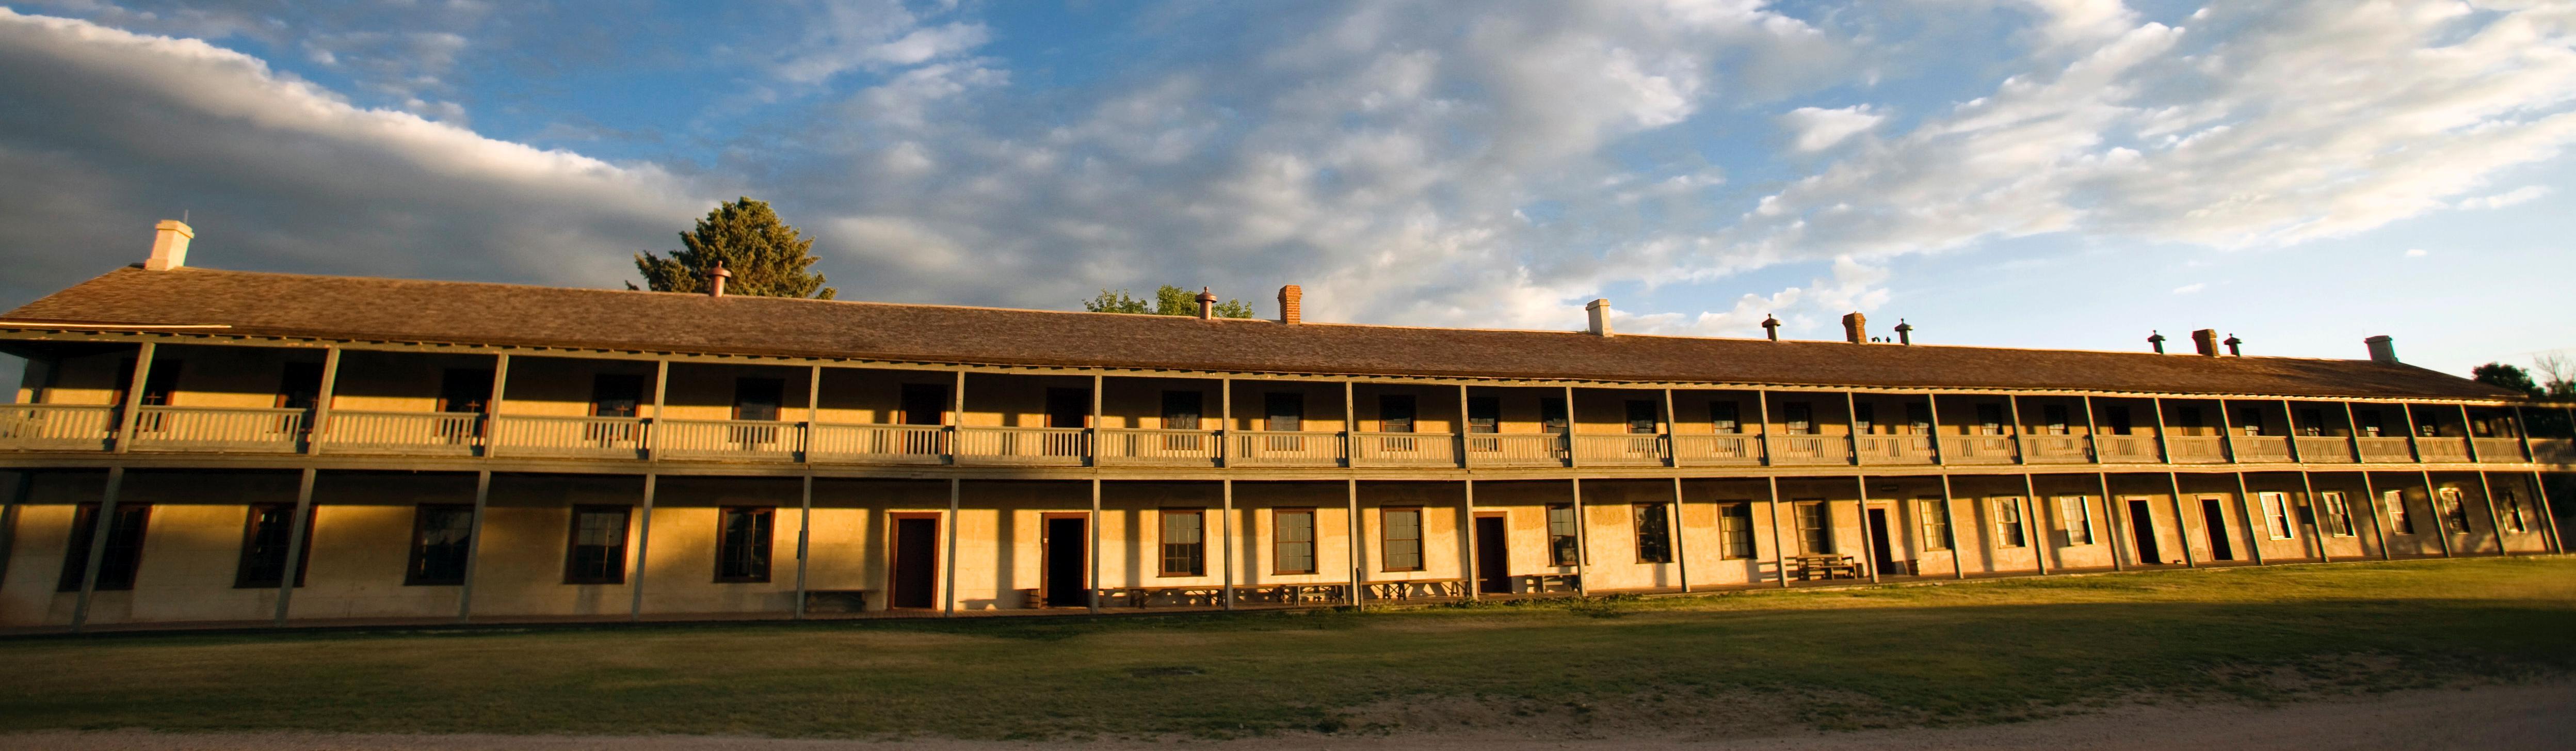 Fort Laramie National Historic Site US National Park